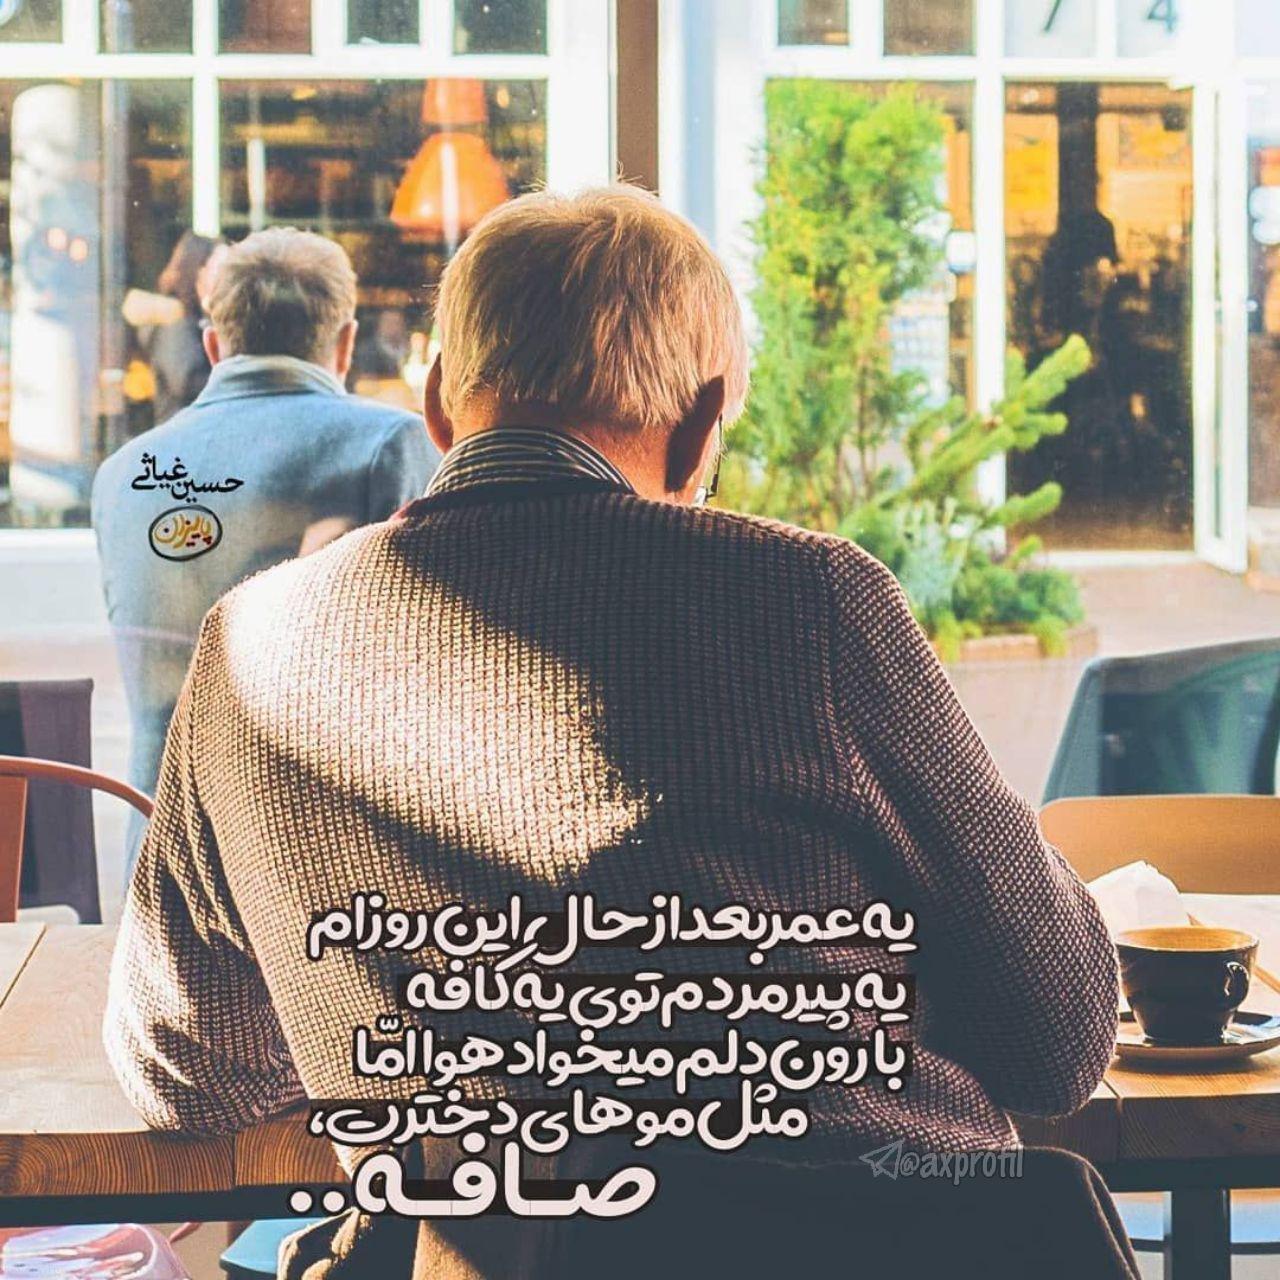 عکس پروفایل عاشقانه غمگین + عکس پروفایل دلشکسته